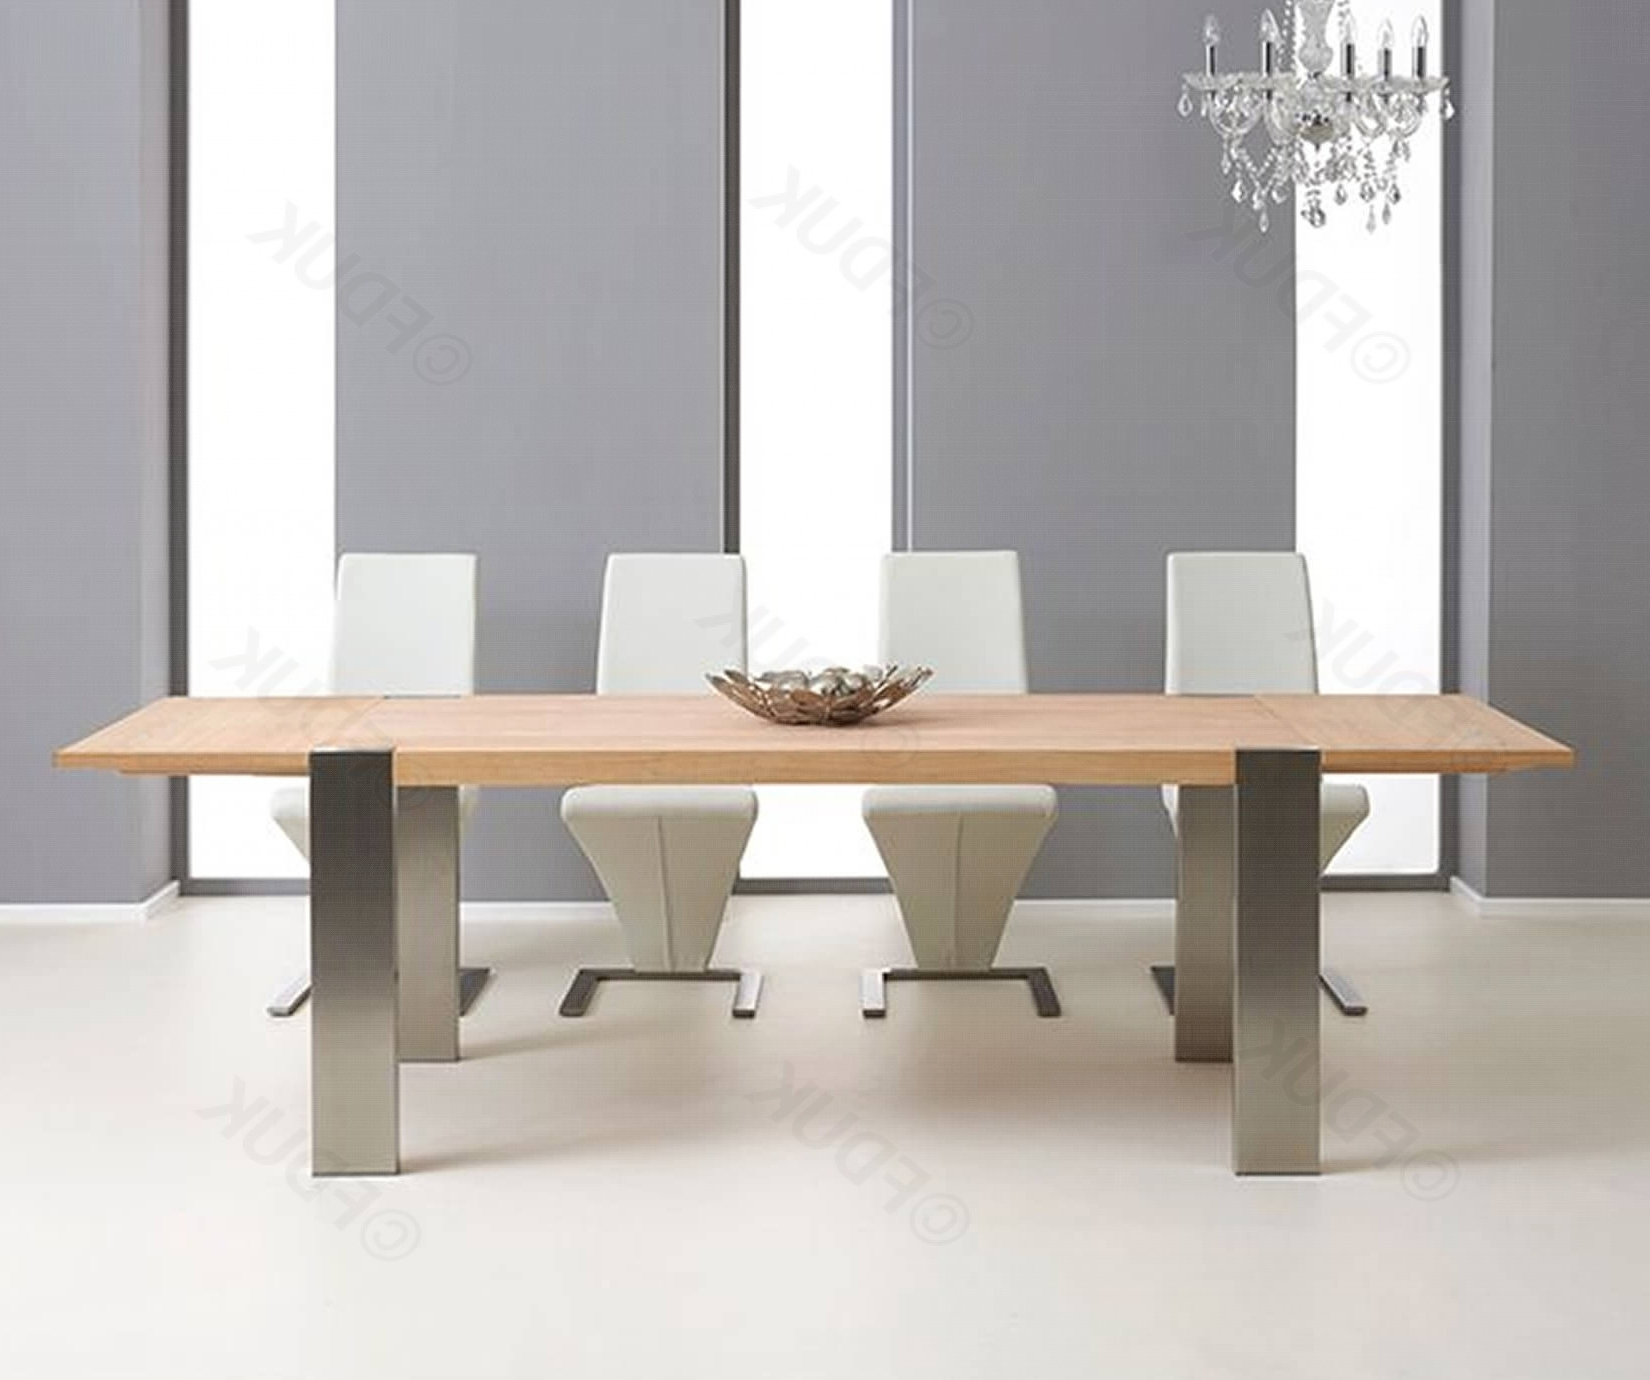 Knightsbridge 180Cm (270Cm) Metal And Oak Extending regarding Well known 180Cm Dining Tables